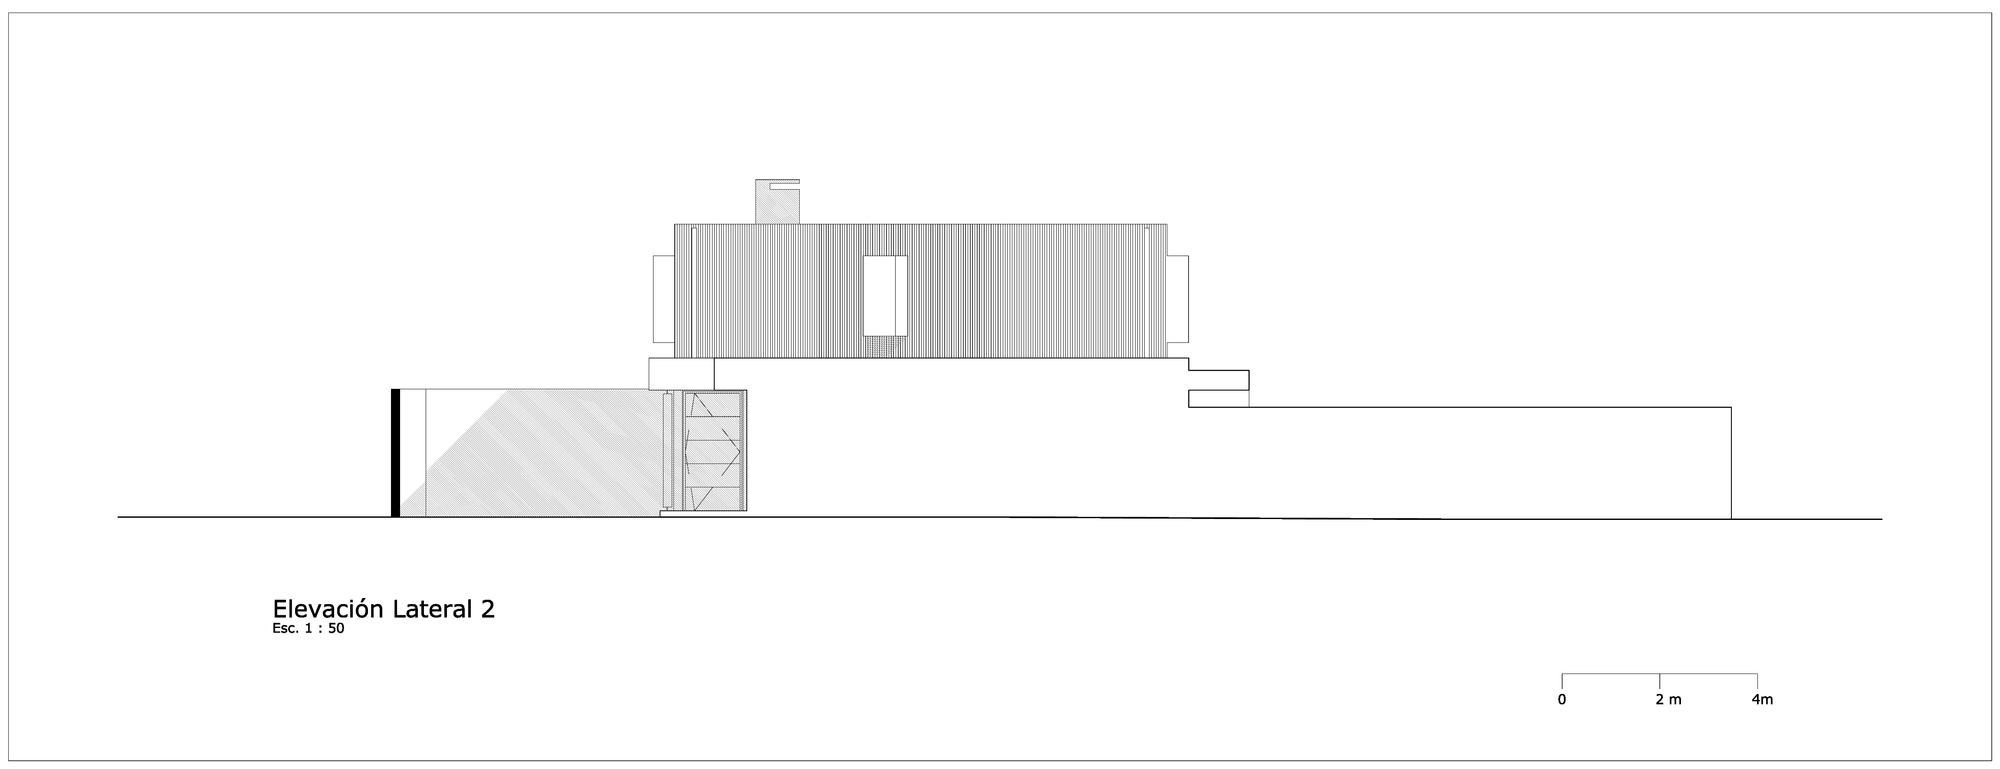 Galer a de casa m laga prietoschaffer arquitectos 16 - Arquitectos interioristas malaga ...